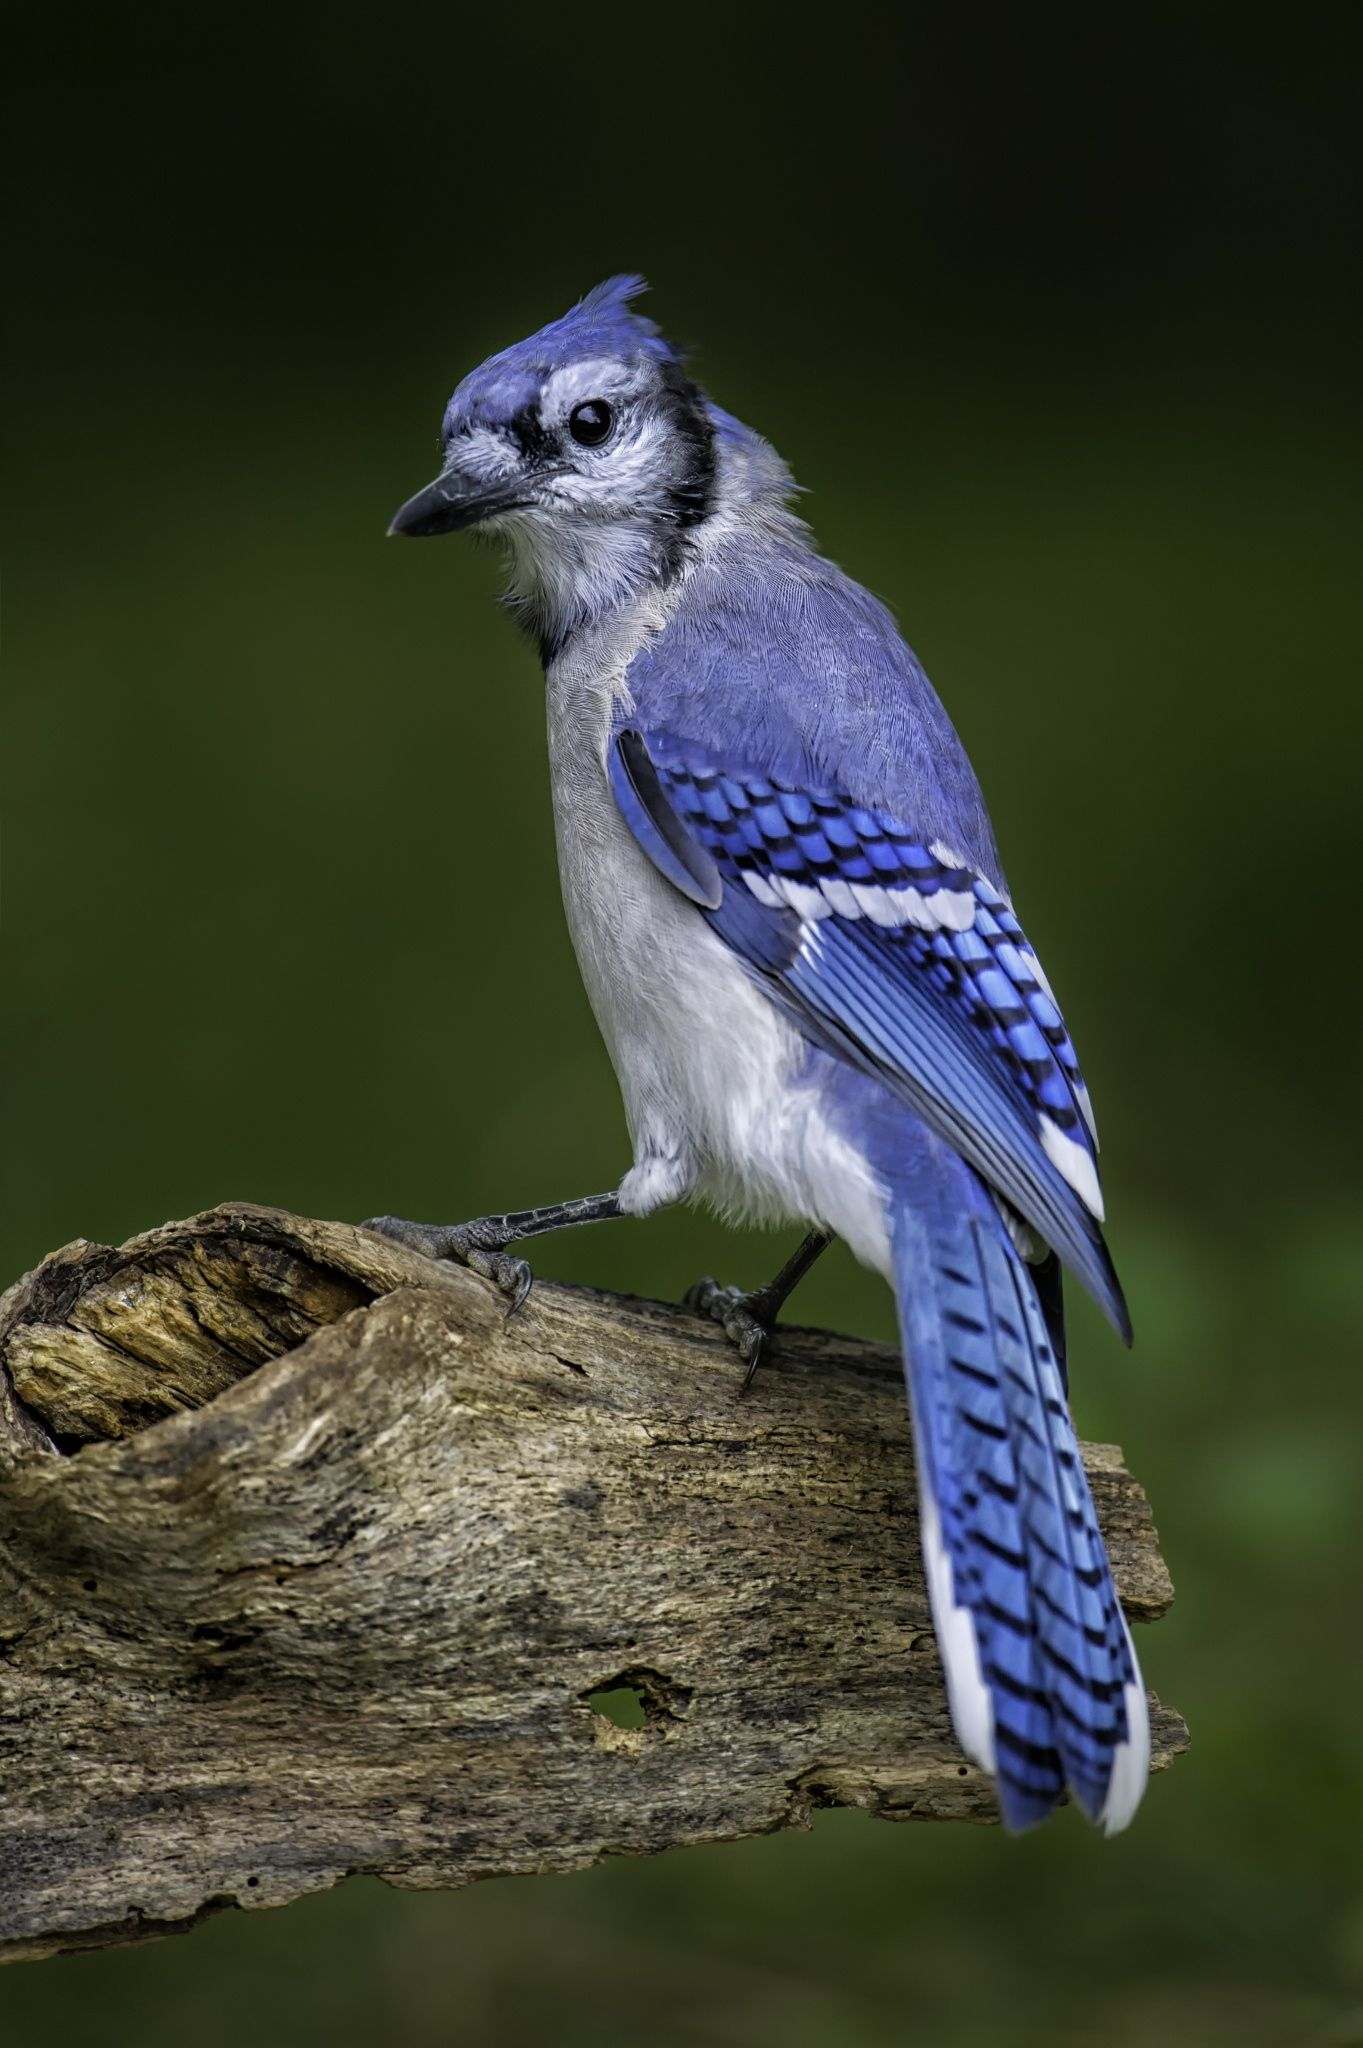 Stumped Blue Jay by Daniel Parent on 500px, Ottawa